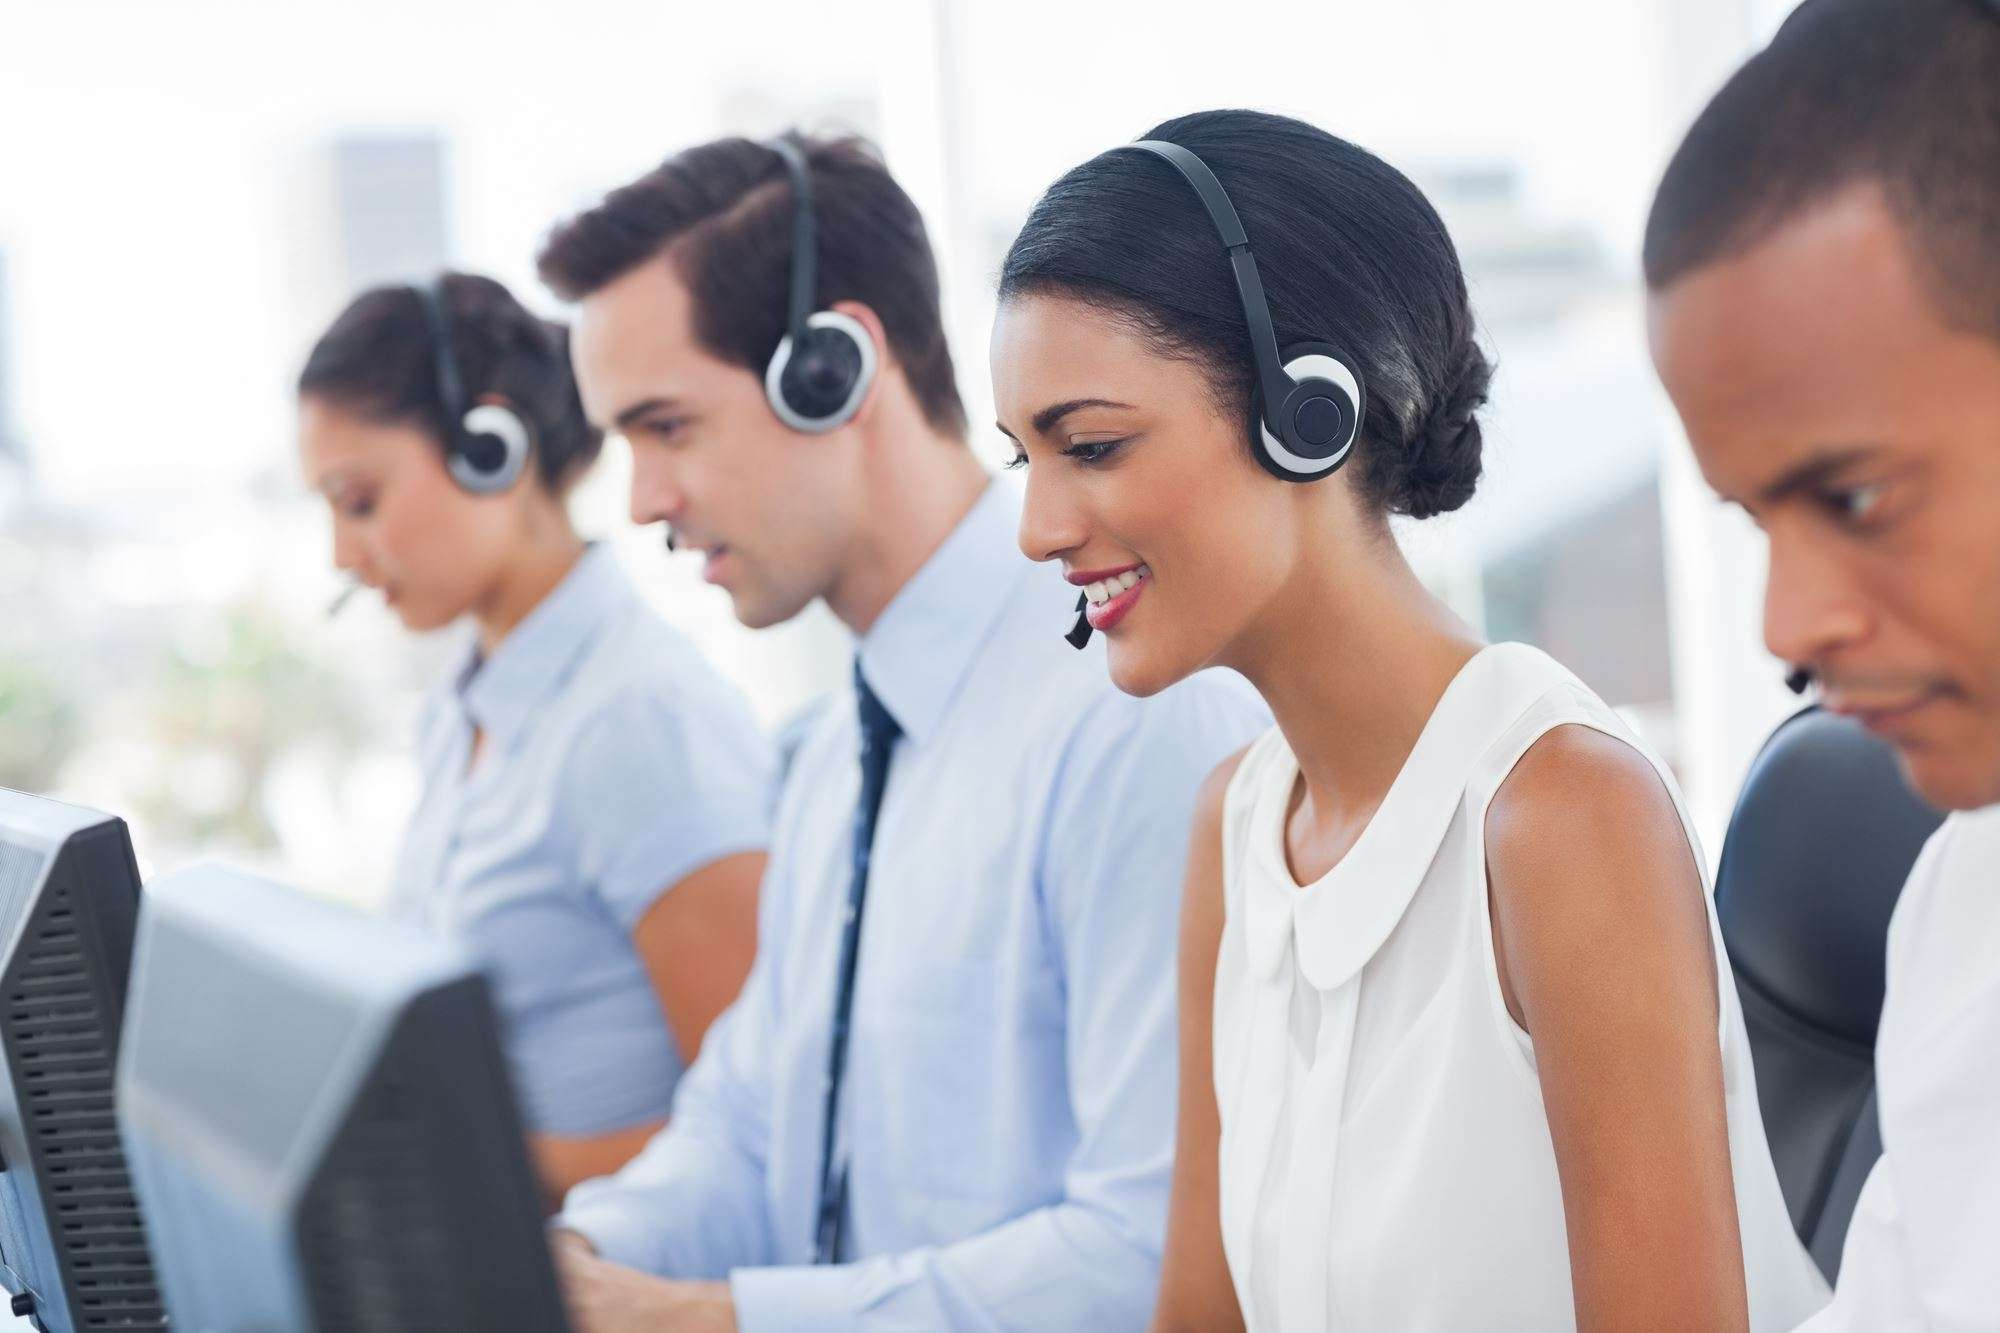 Call center staff